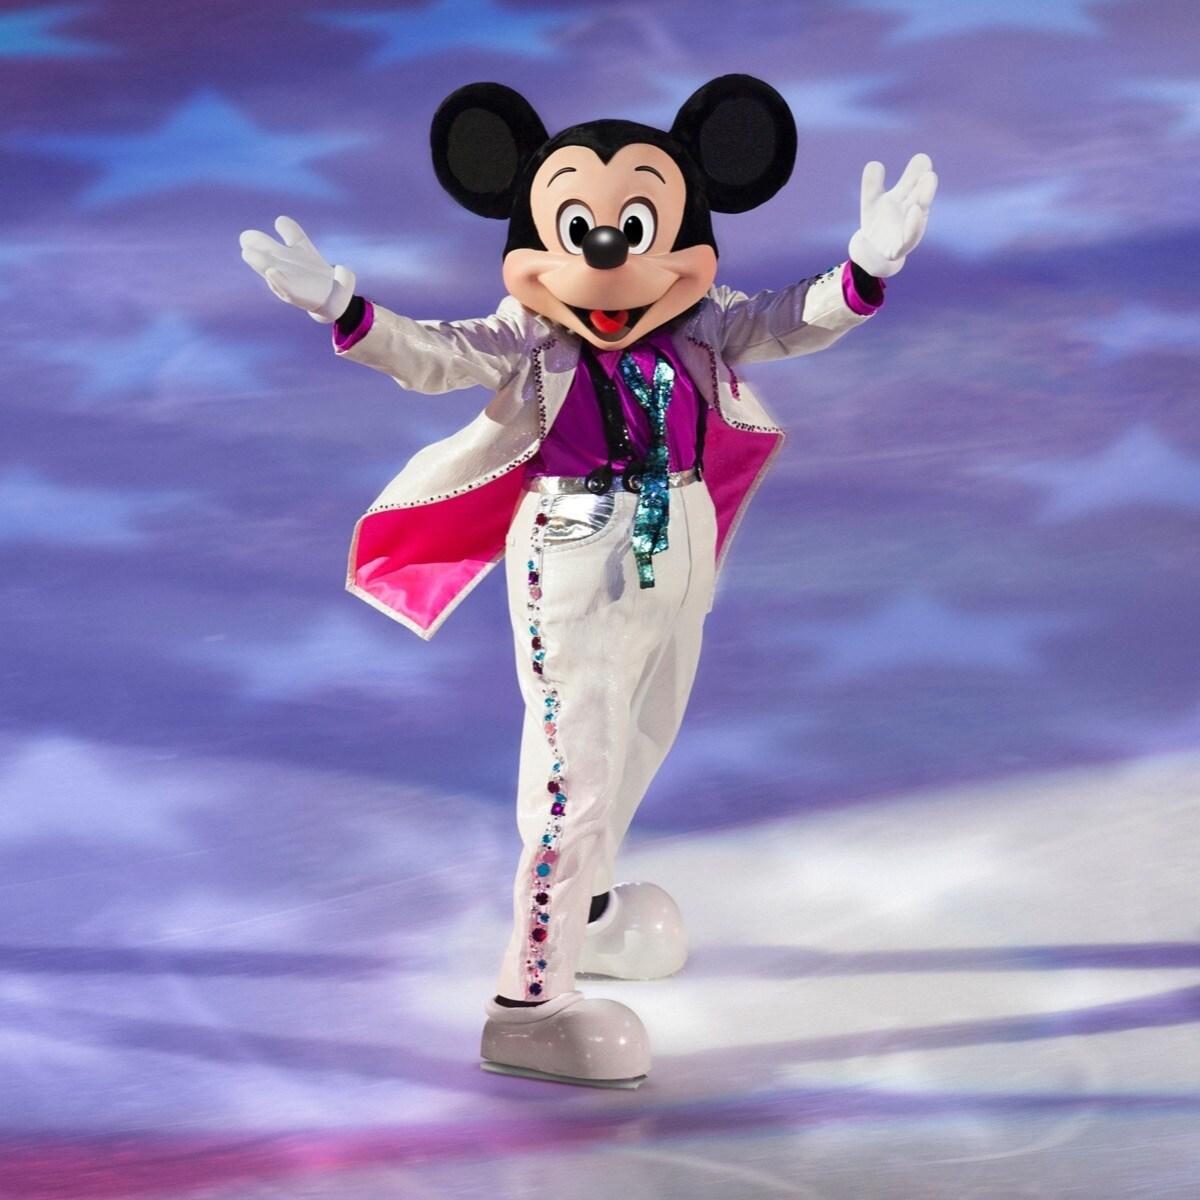 Musse Pigg i en vit kostym med armarna upp på isen